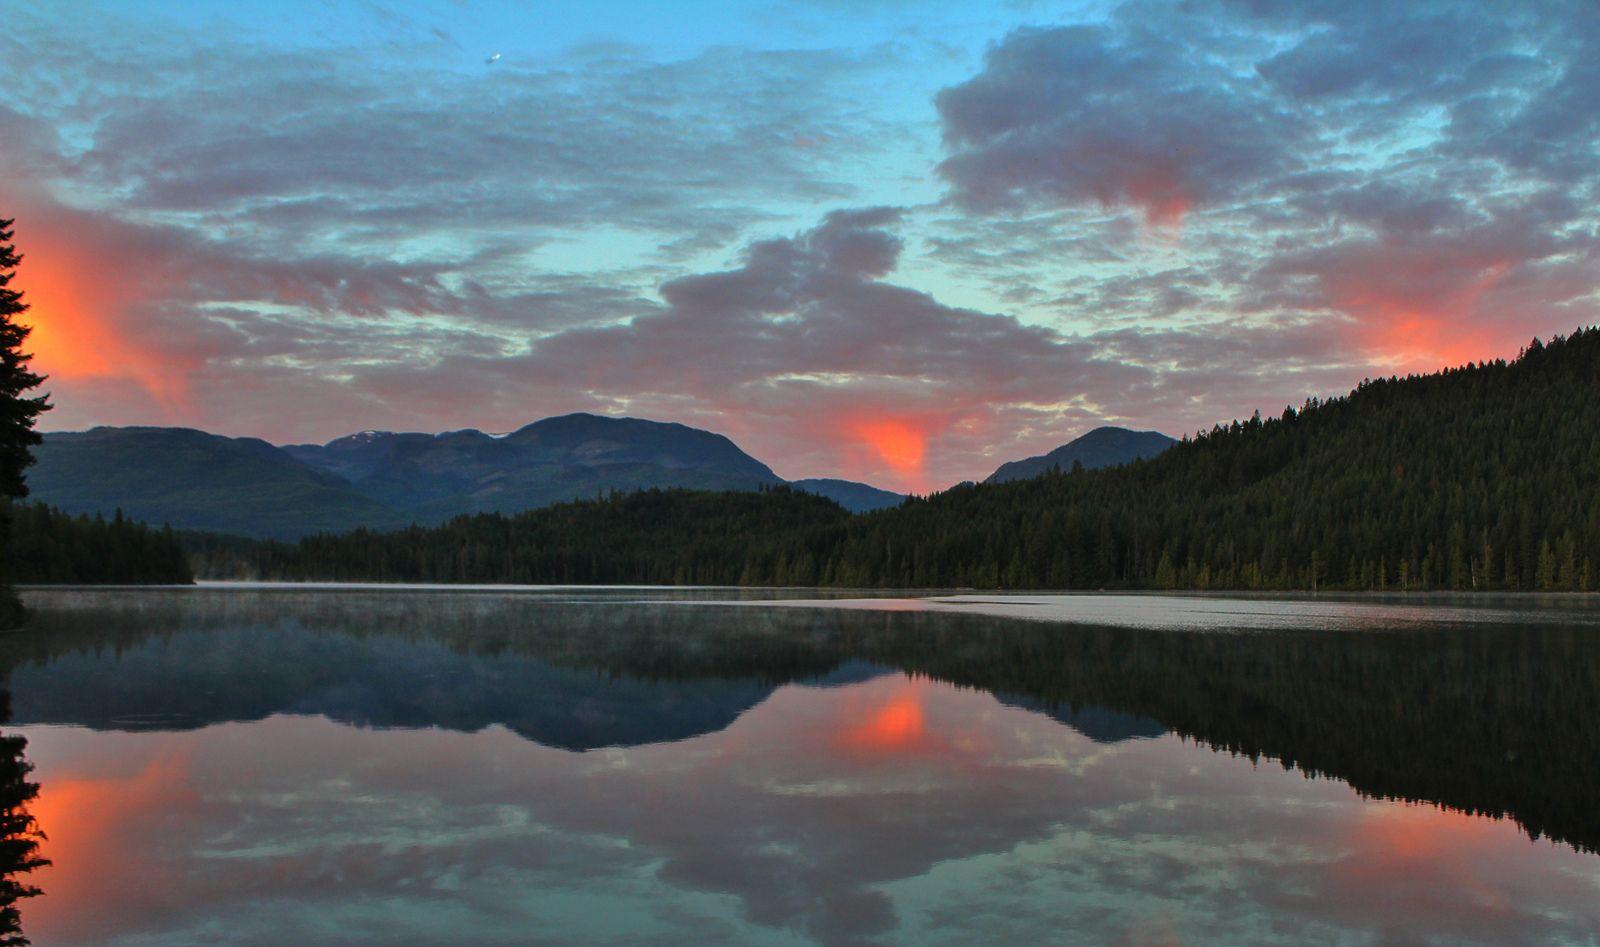 Reflections of fire / Reflets de feu / Reflexiones de fuego | Flickr - Photo Sharing!